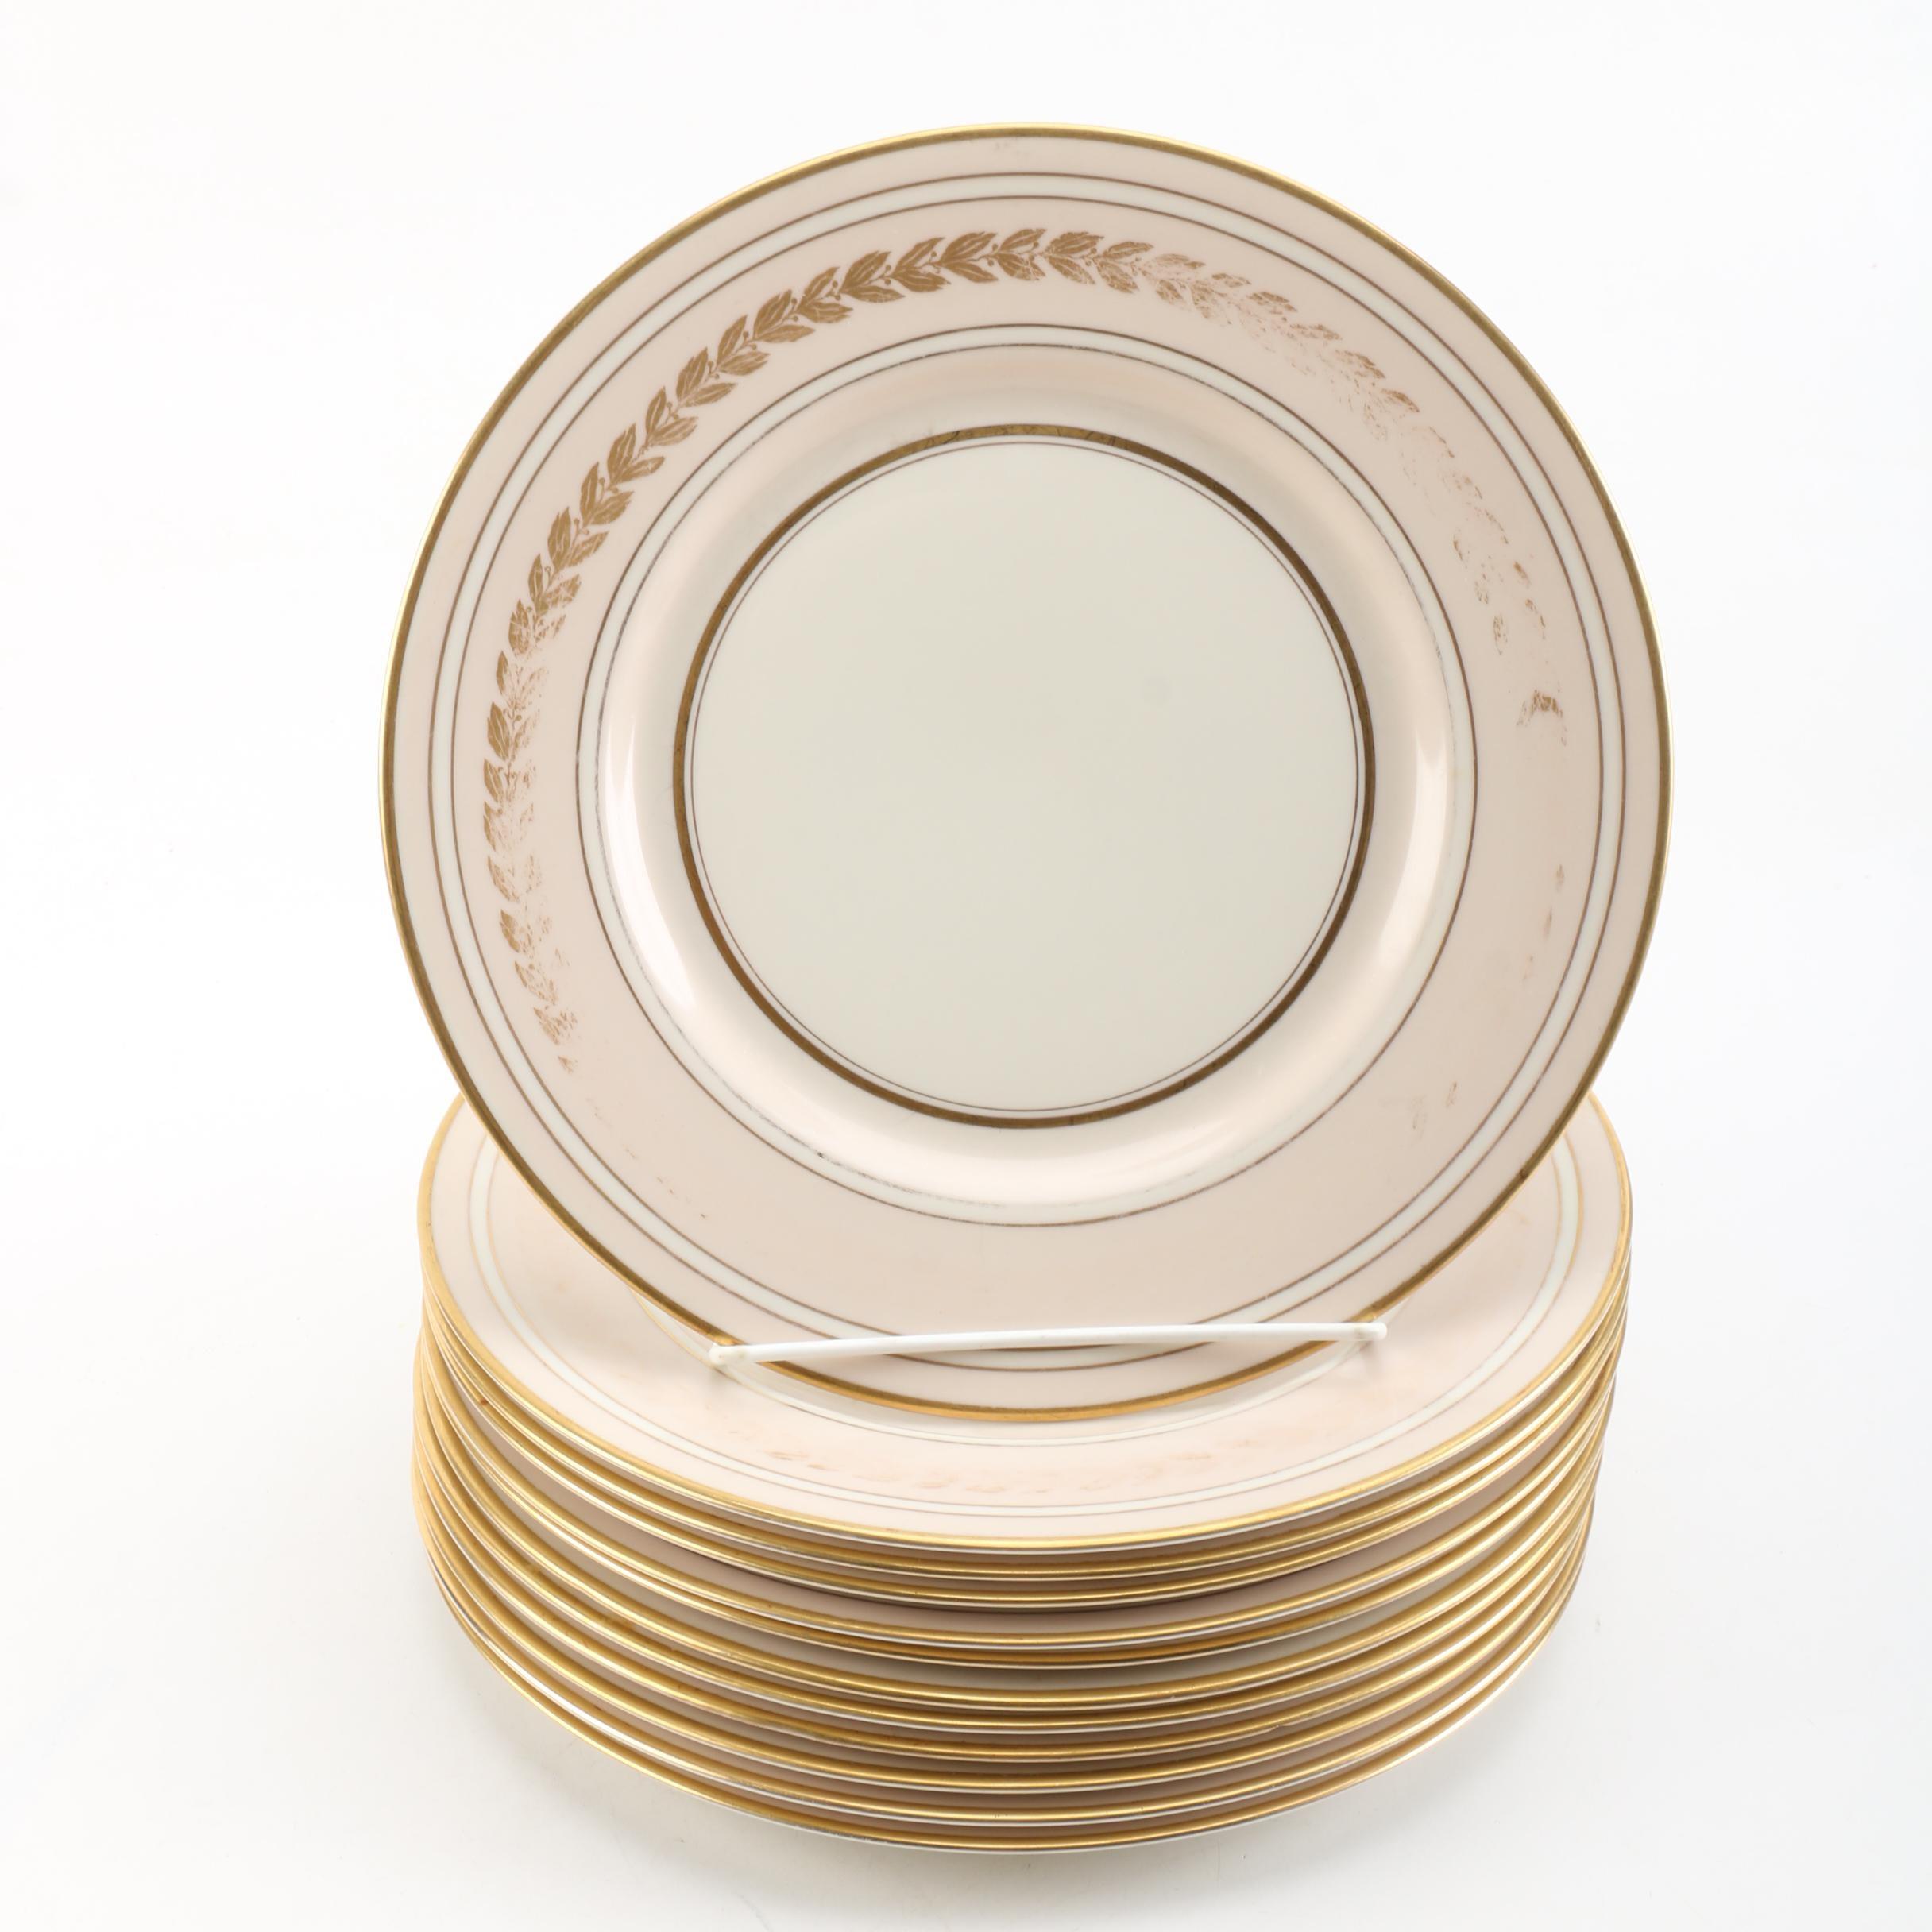 Fine Concorde China Gilded Porcelain Plates